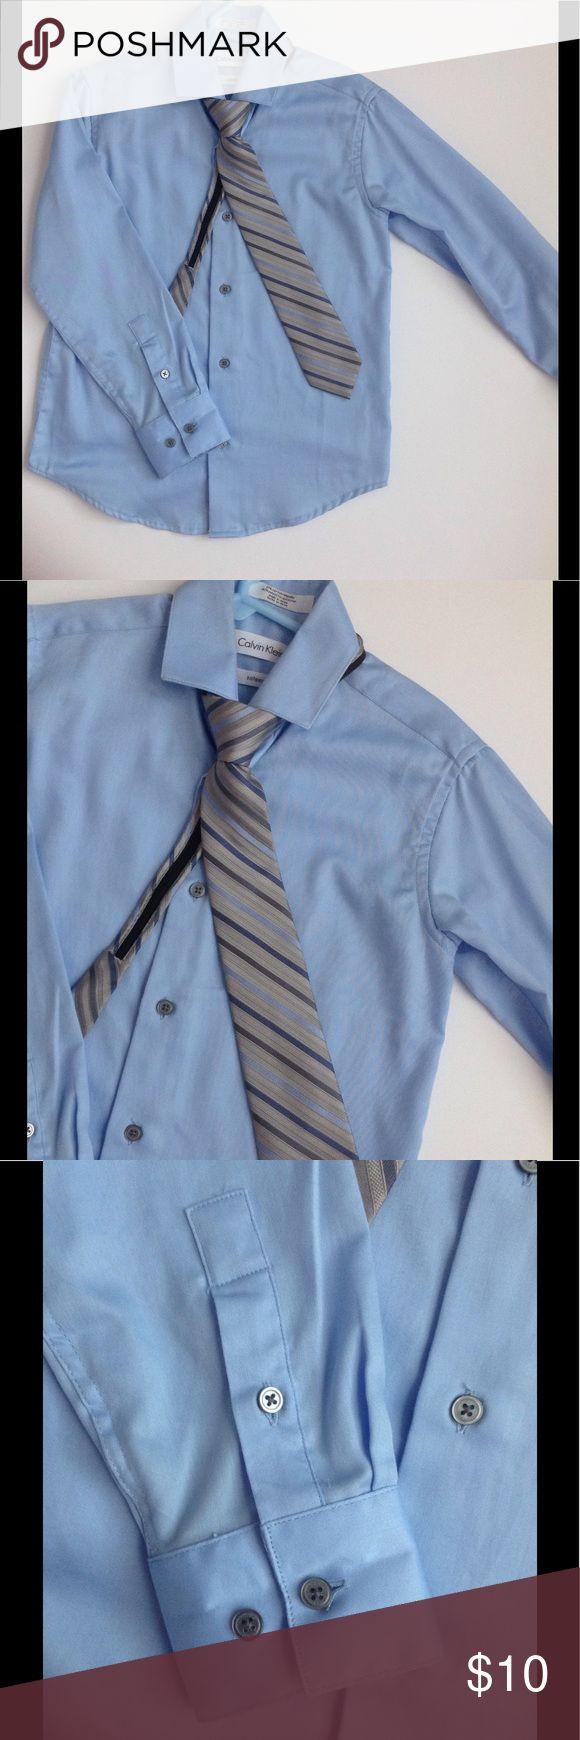 Calvin Klein Boy's Long Sleeve Sateen Dress Shirt WORN ONCE. Long sleeve dress shirt with button front placket and shirttail hem. Spread collar. Buttoned cuffs. Dry clean only. Zipper tie included. Calvin Klein Shirts & Tops Button Down Shirts